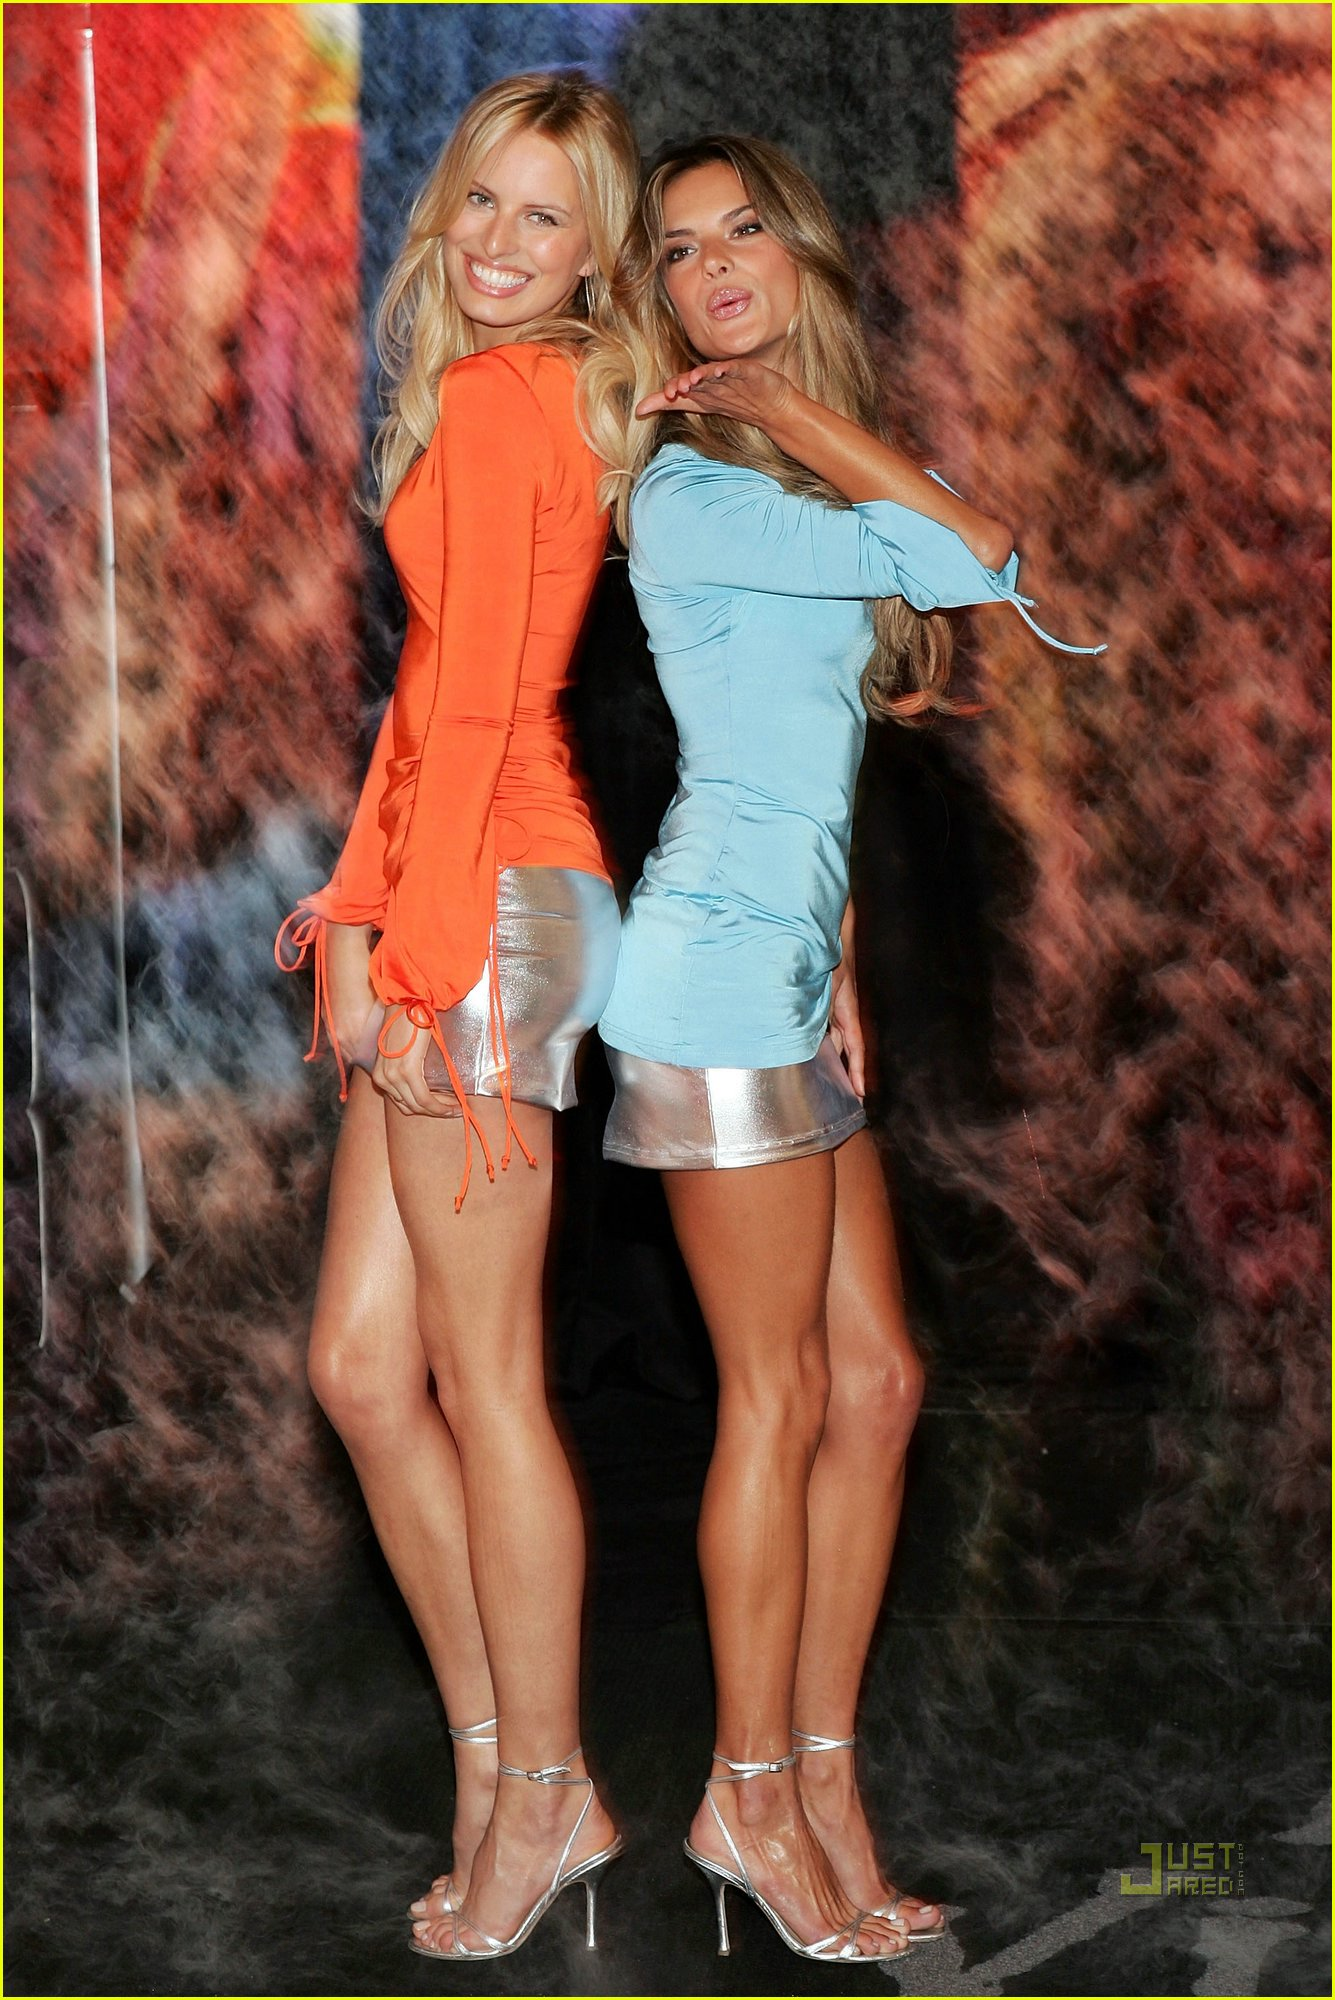 Very Cute Girl Wallpaper Victorias Secret Models In Blue And Orange Dress